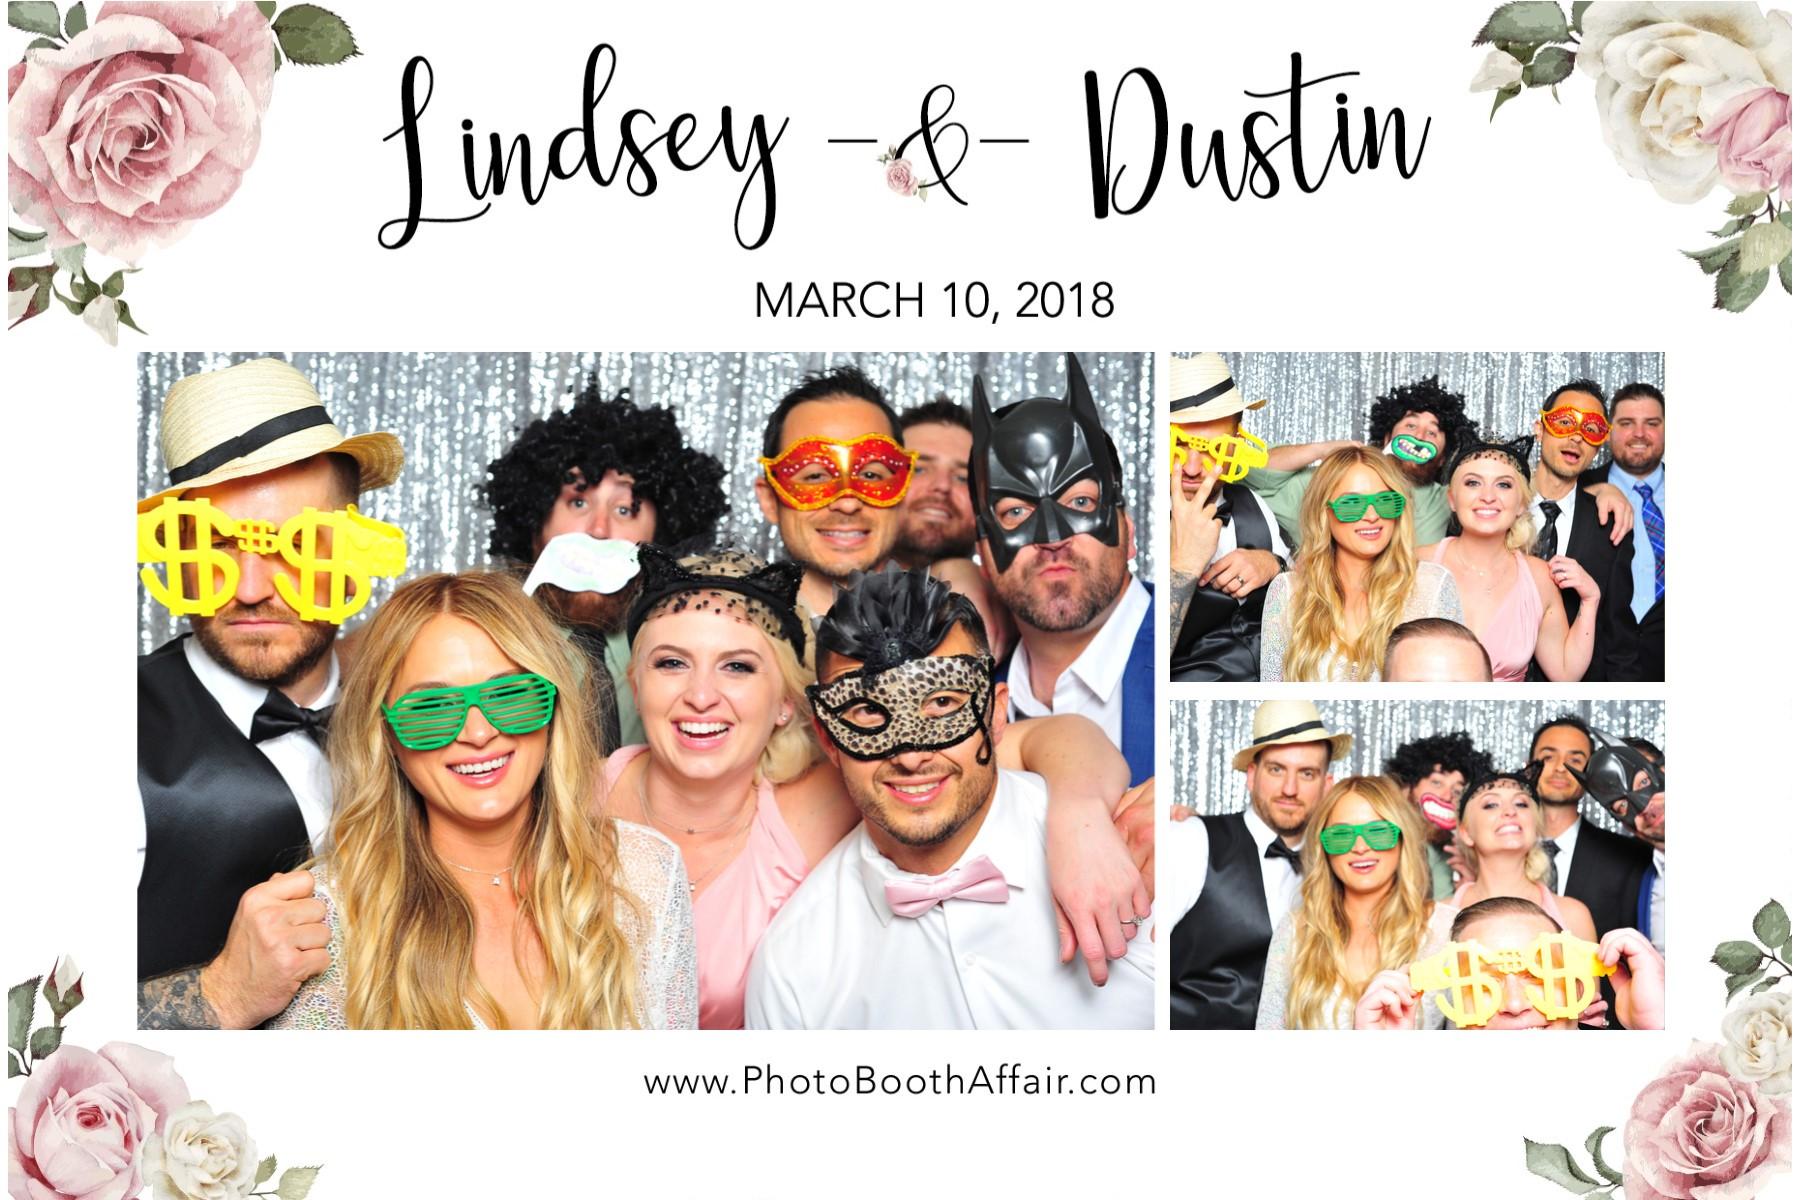 Dustin + Lindsey - Prints - Photo Booth Affair 31